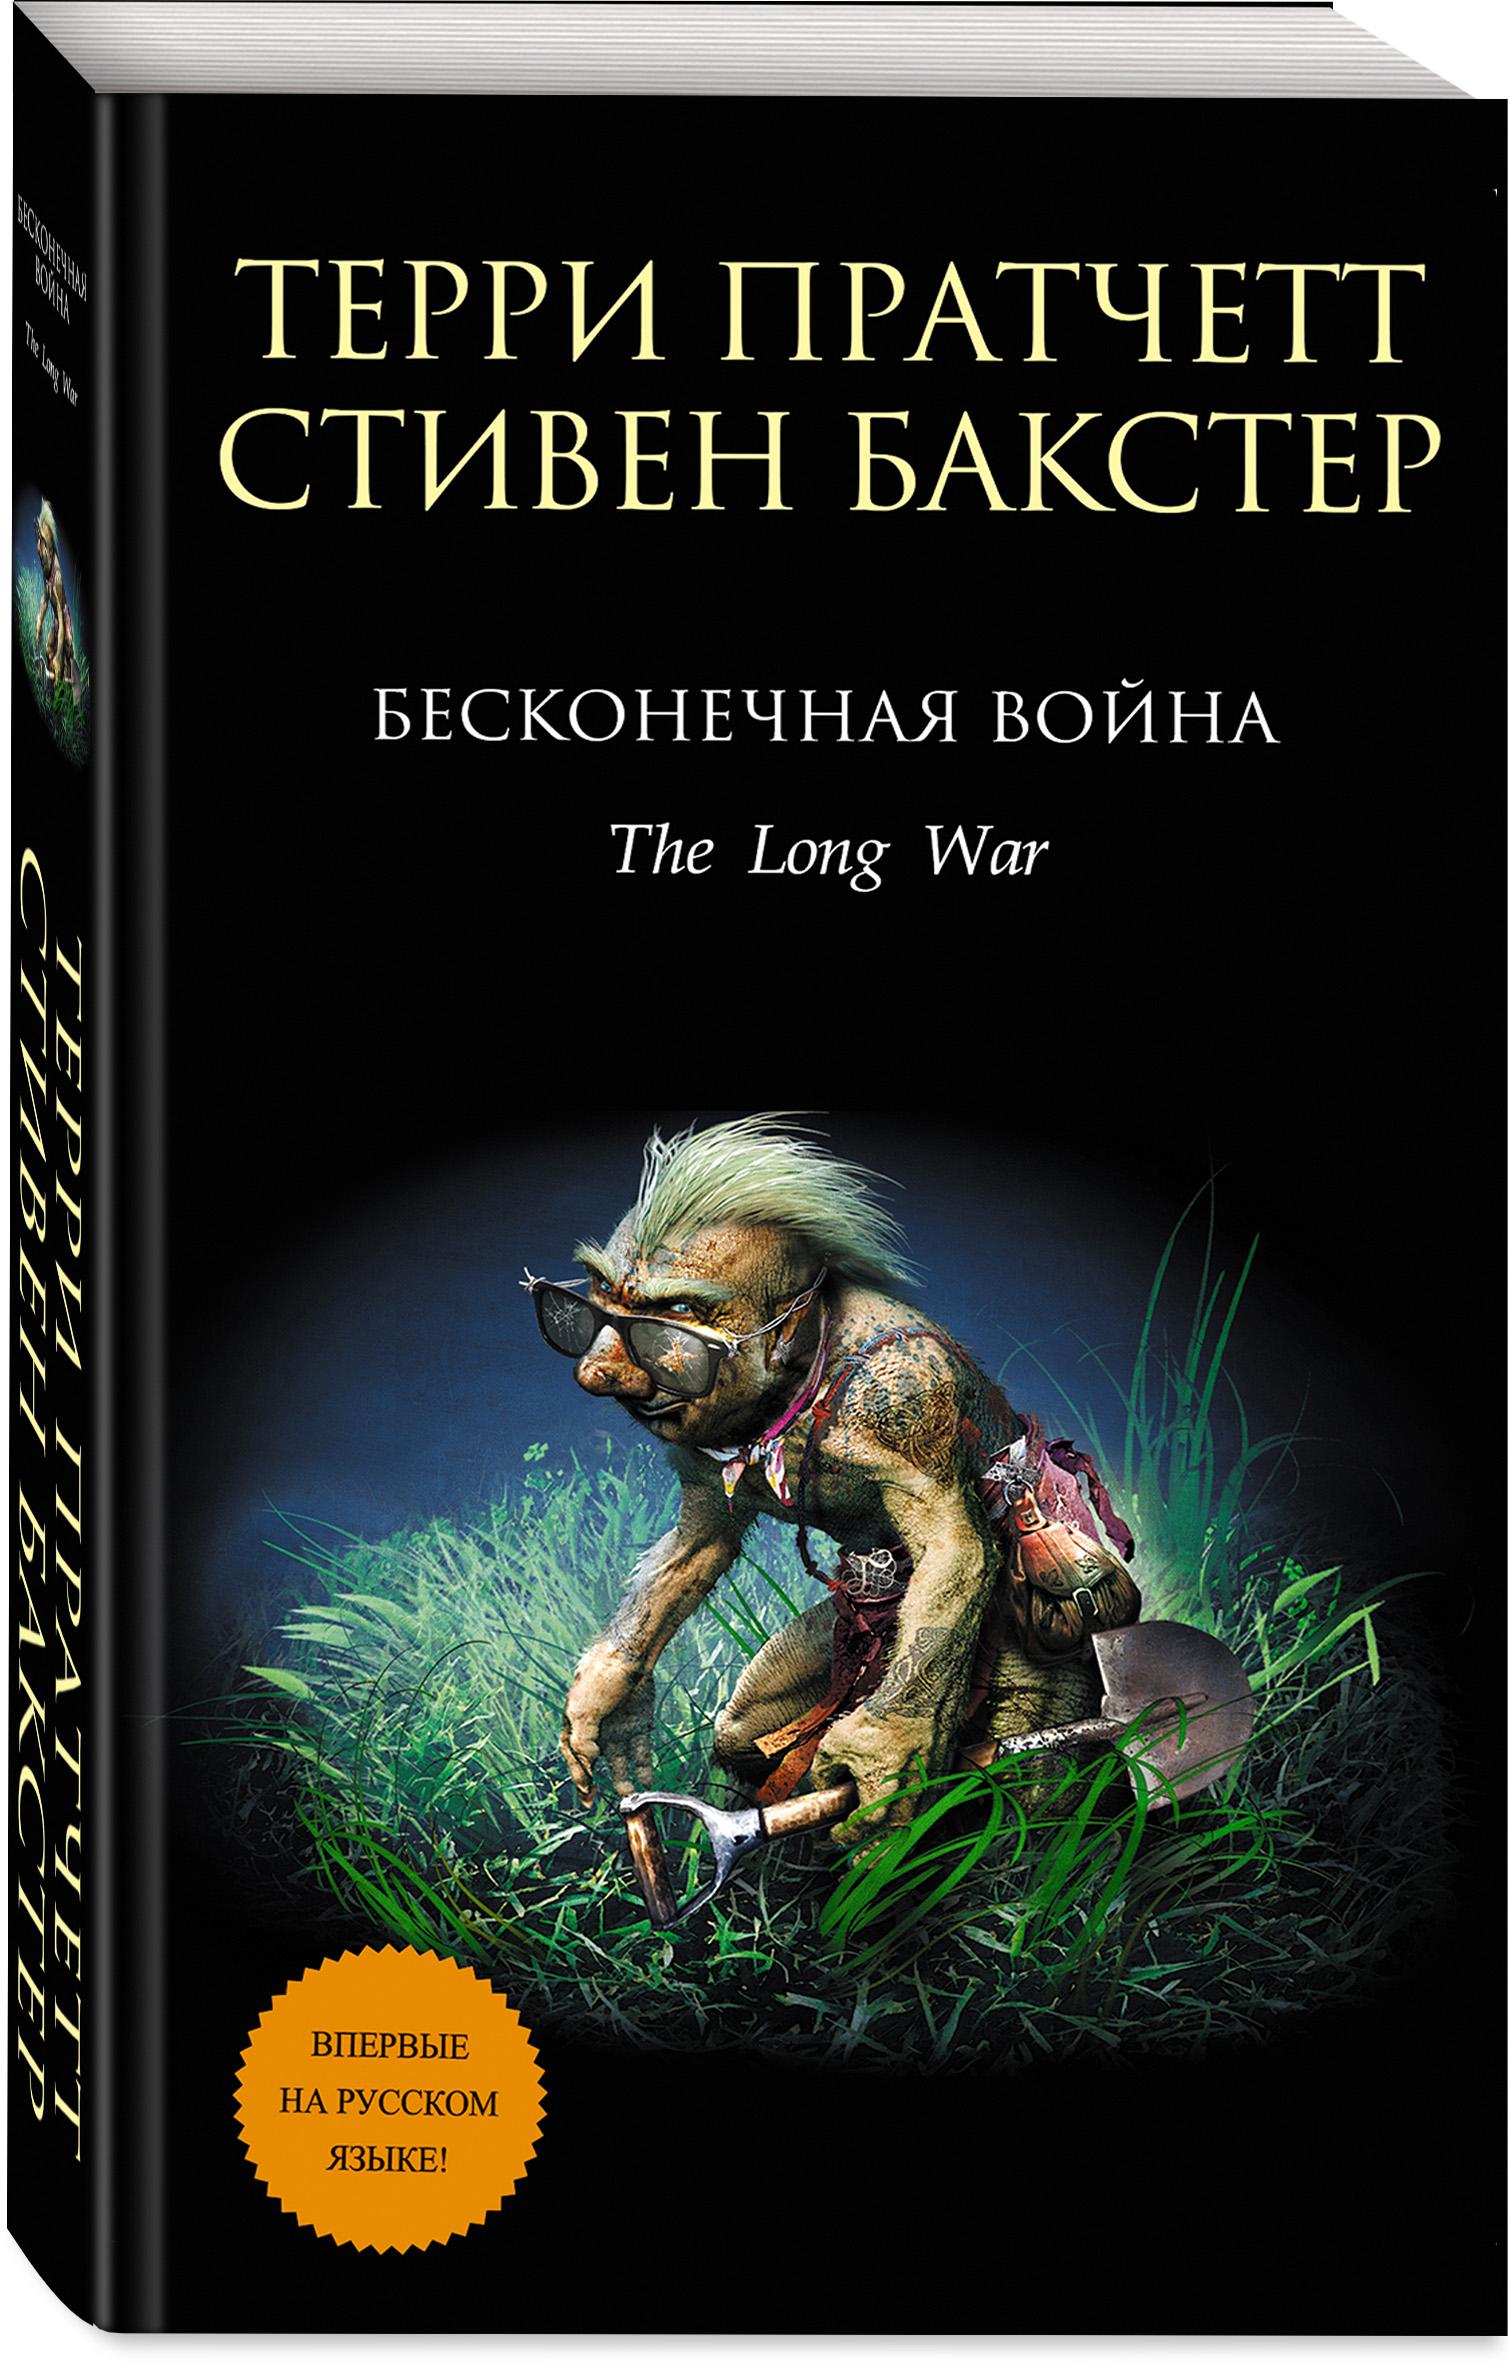 Терри Пратчетт, Стивен Бакстер Бесконечная война